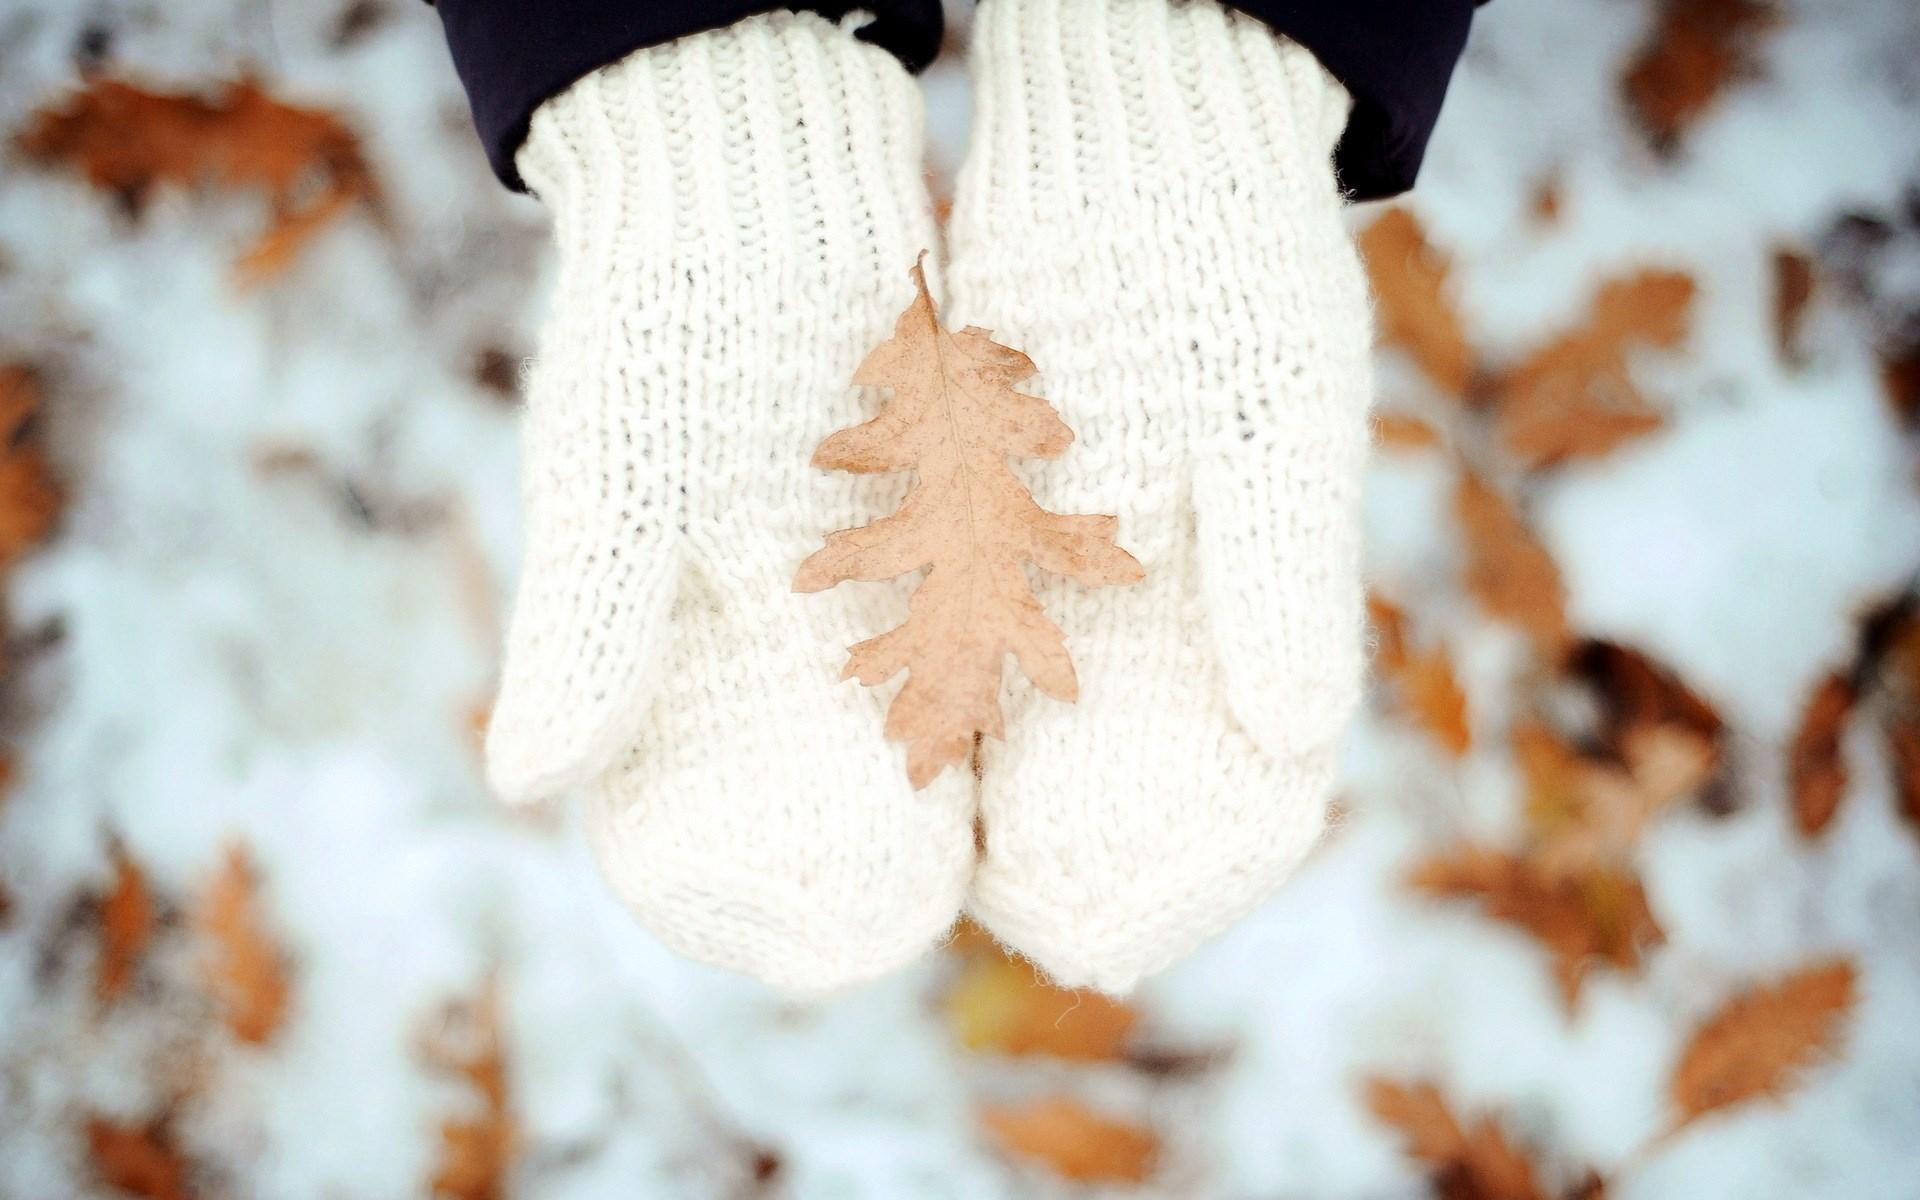 winter pictures for desktop background